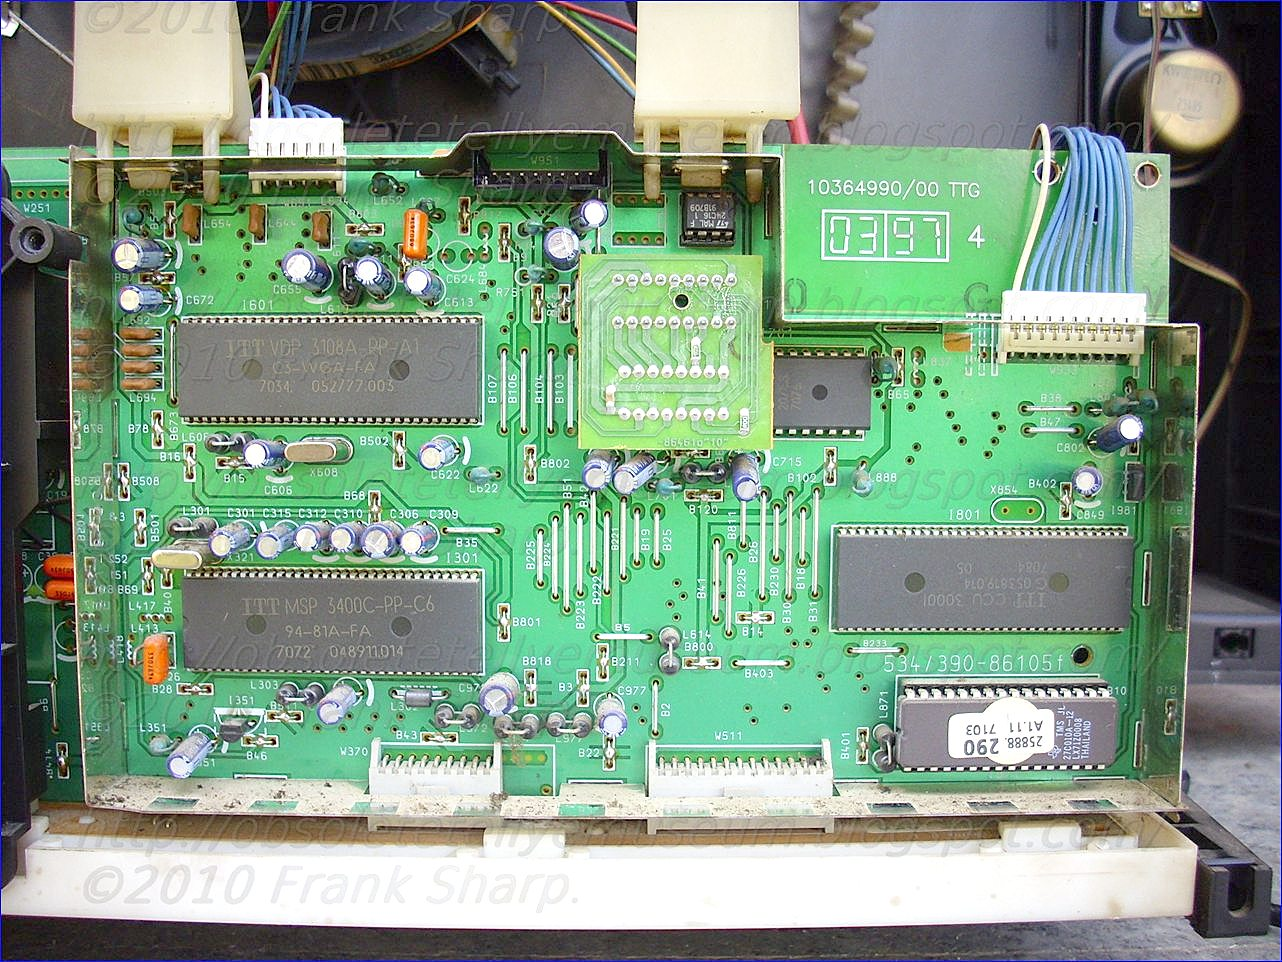 Obsolete Technology Tellye !: LOEWE CT1170 (Art No 57410L